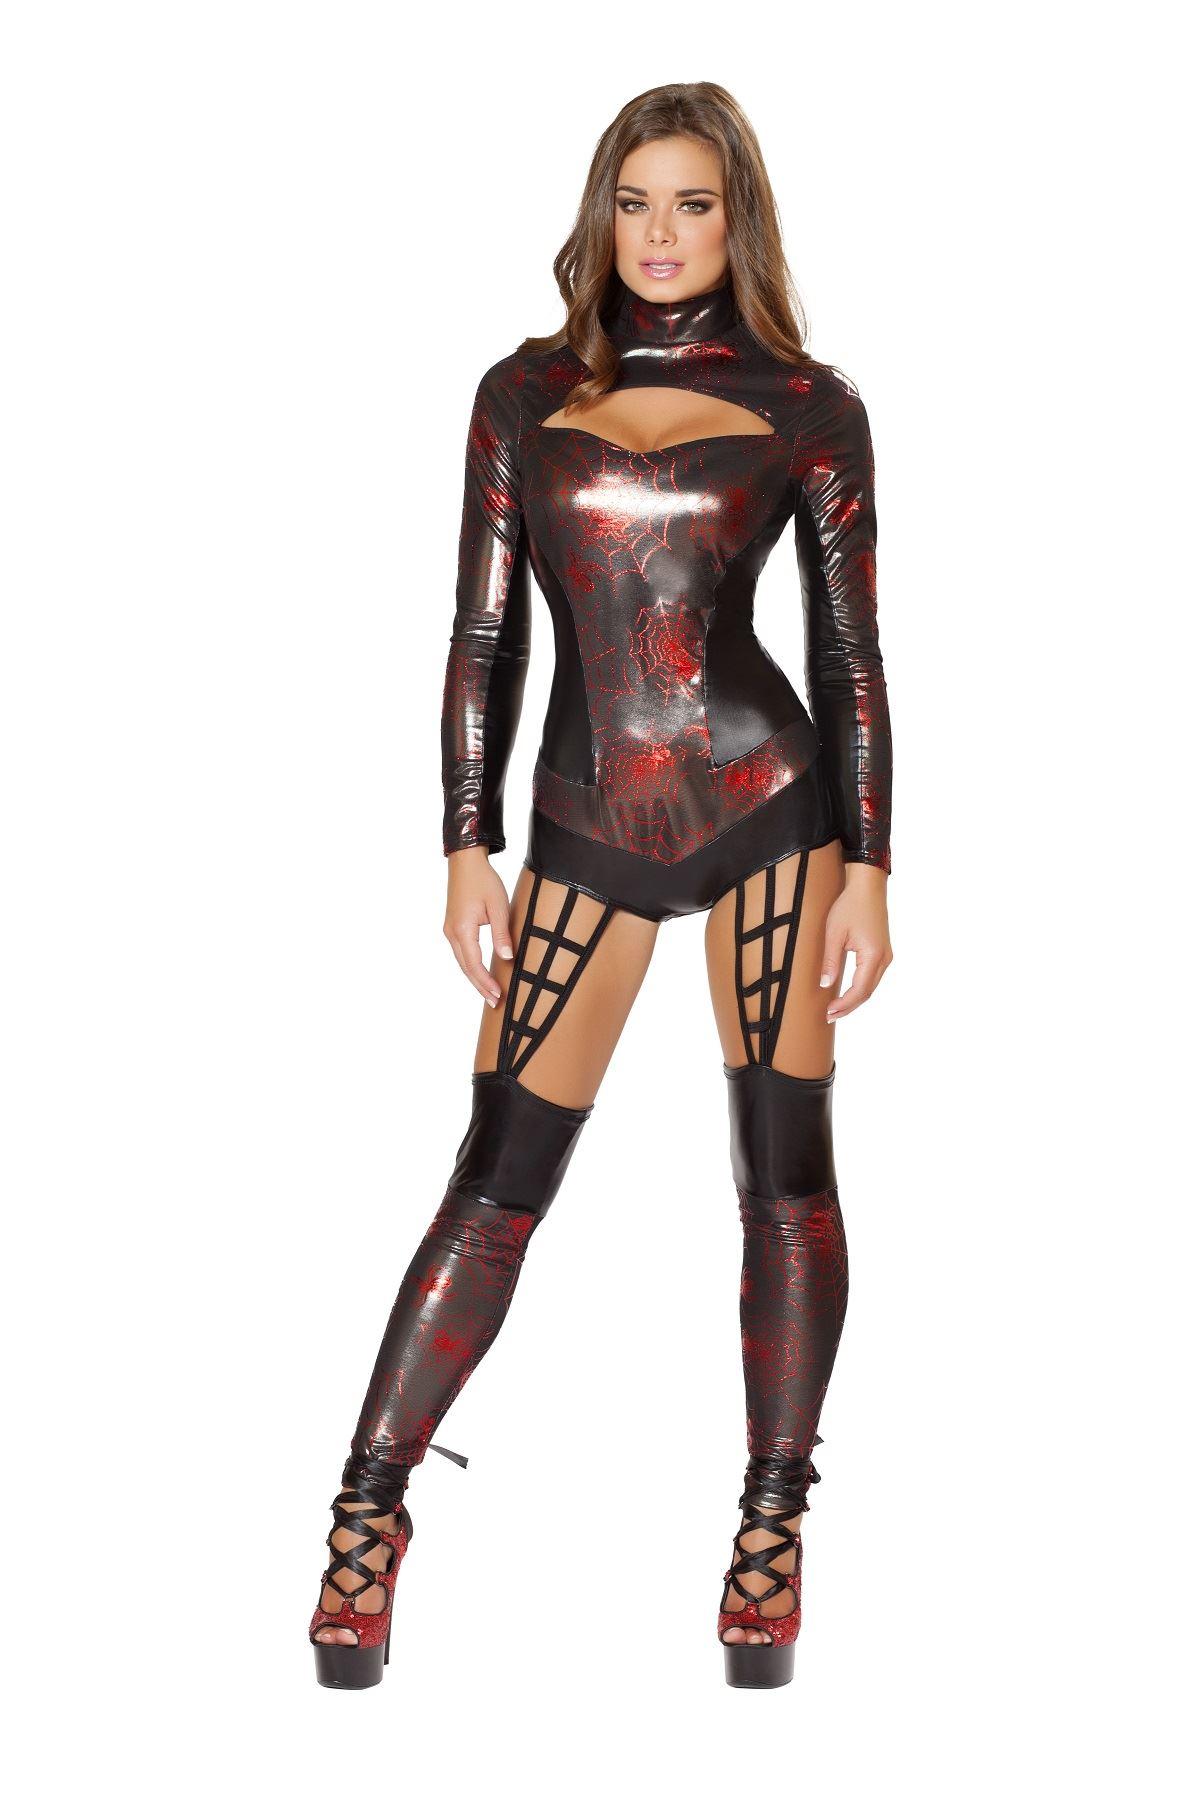 Adult Web Spinner Superhero Woman Costume ...  sc 1 st  The Costume Land & Adult Web Spinner Superhero Woman Costume | $104.99 | The Costume Land